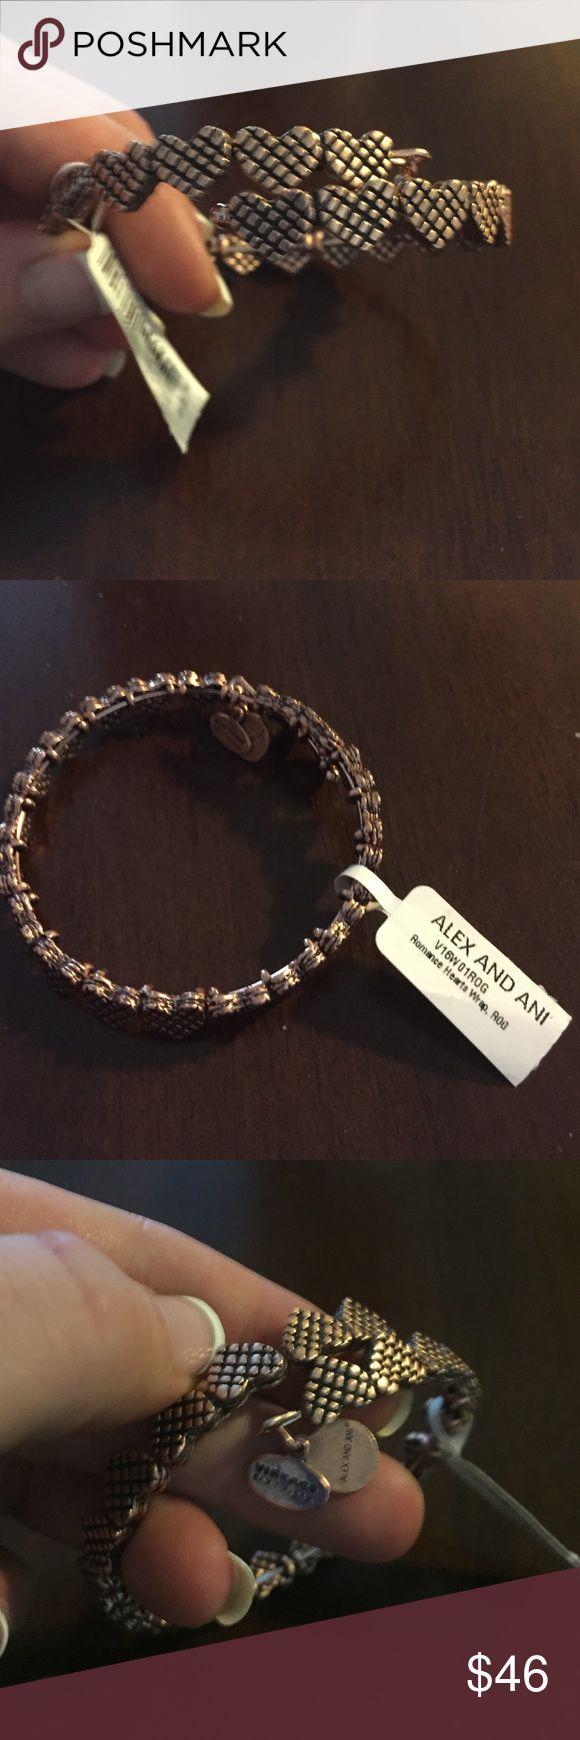 Alex and Ani bracelet Alex and Ani rose gold romantic hearts wrap bracelet. New with retail tags. Alex and Ani Vintage sixty-six Alex & Ani Jewelry Bracelets